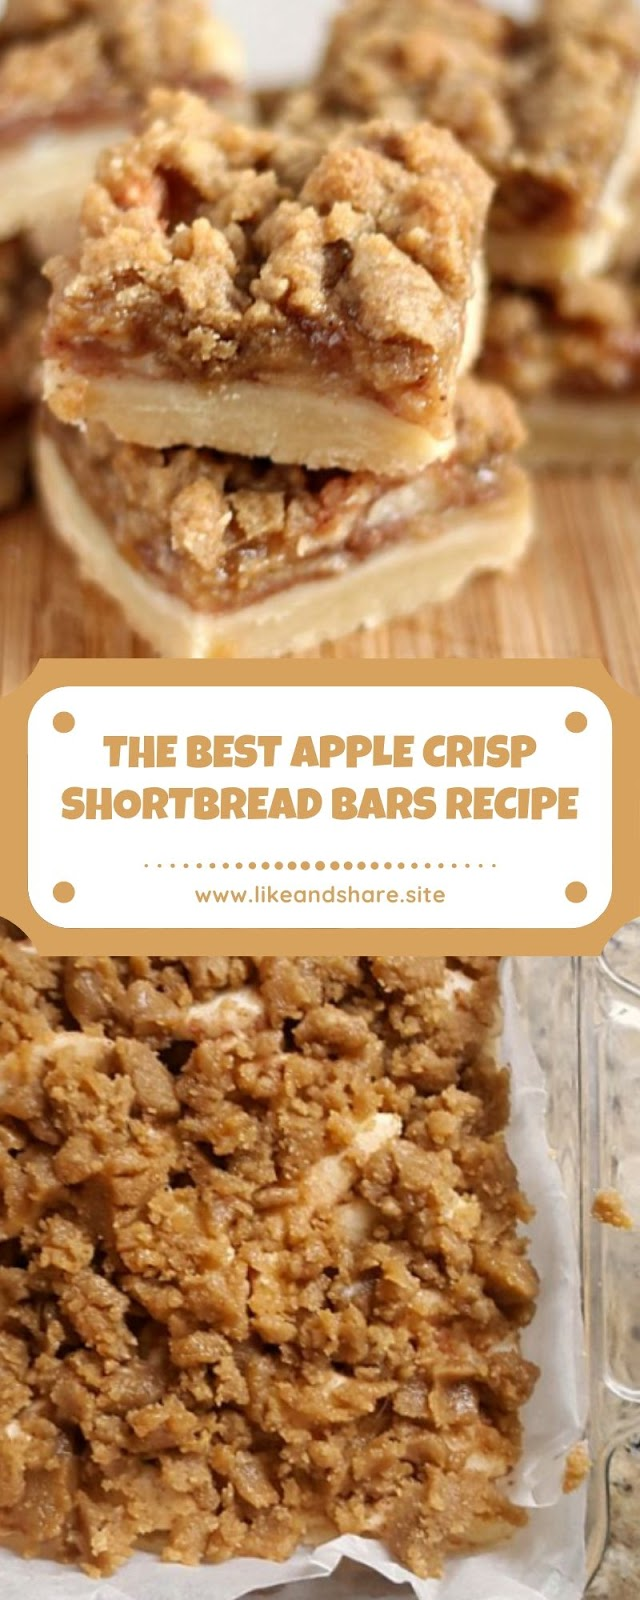 THE BEST APPLE CRISP SHORTBREAD BARS RECIPE